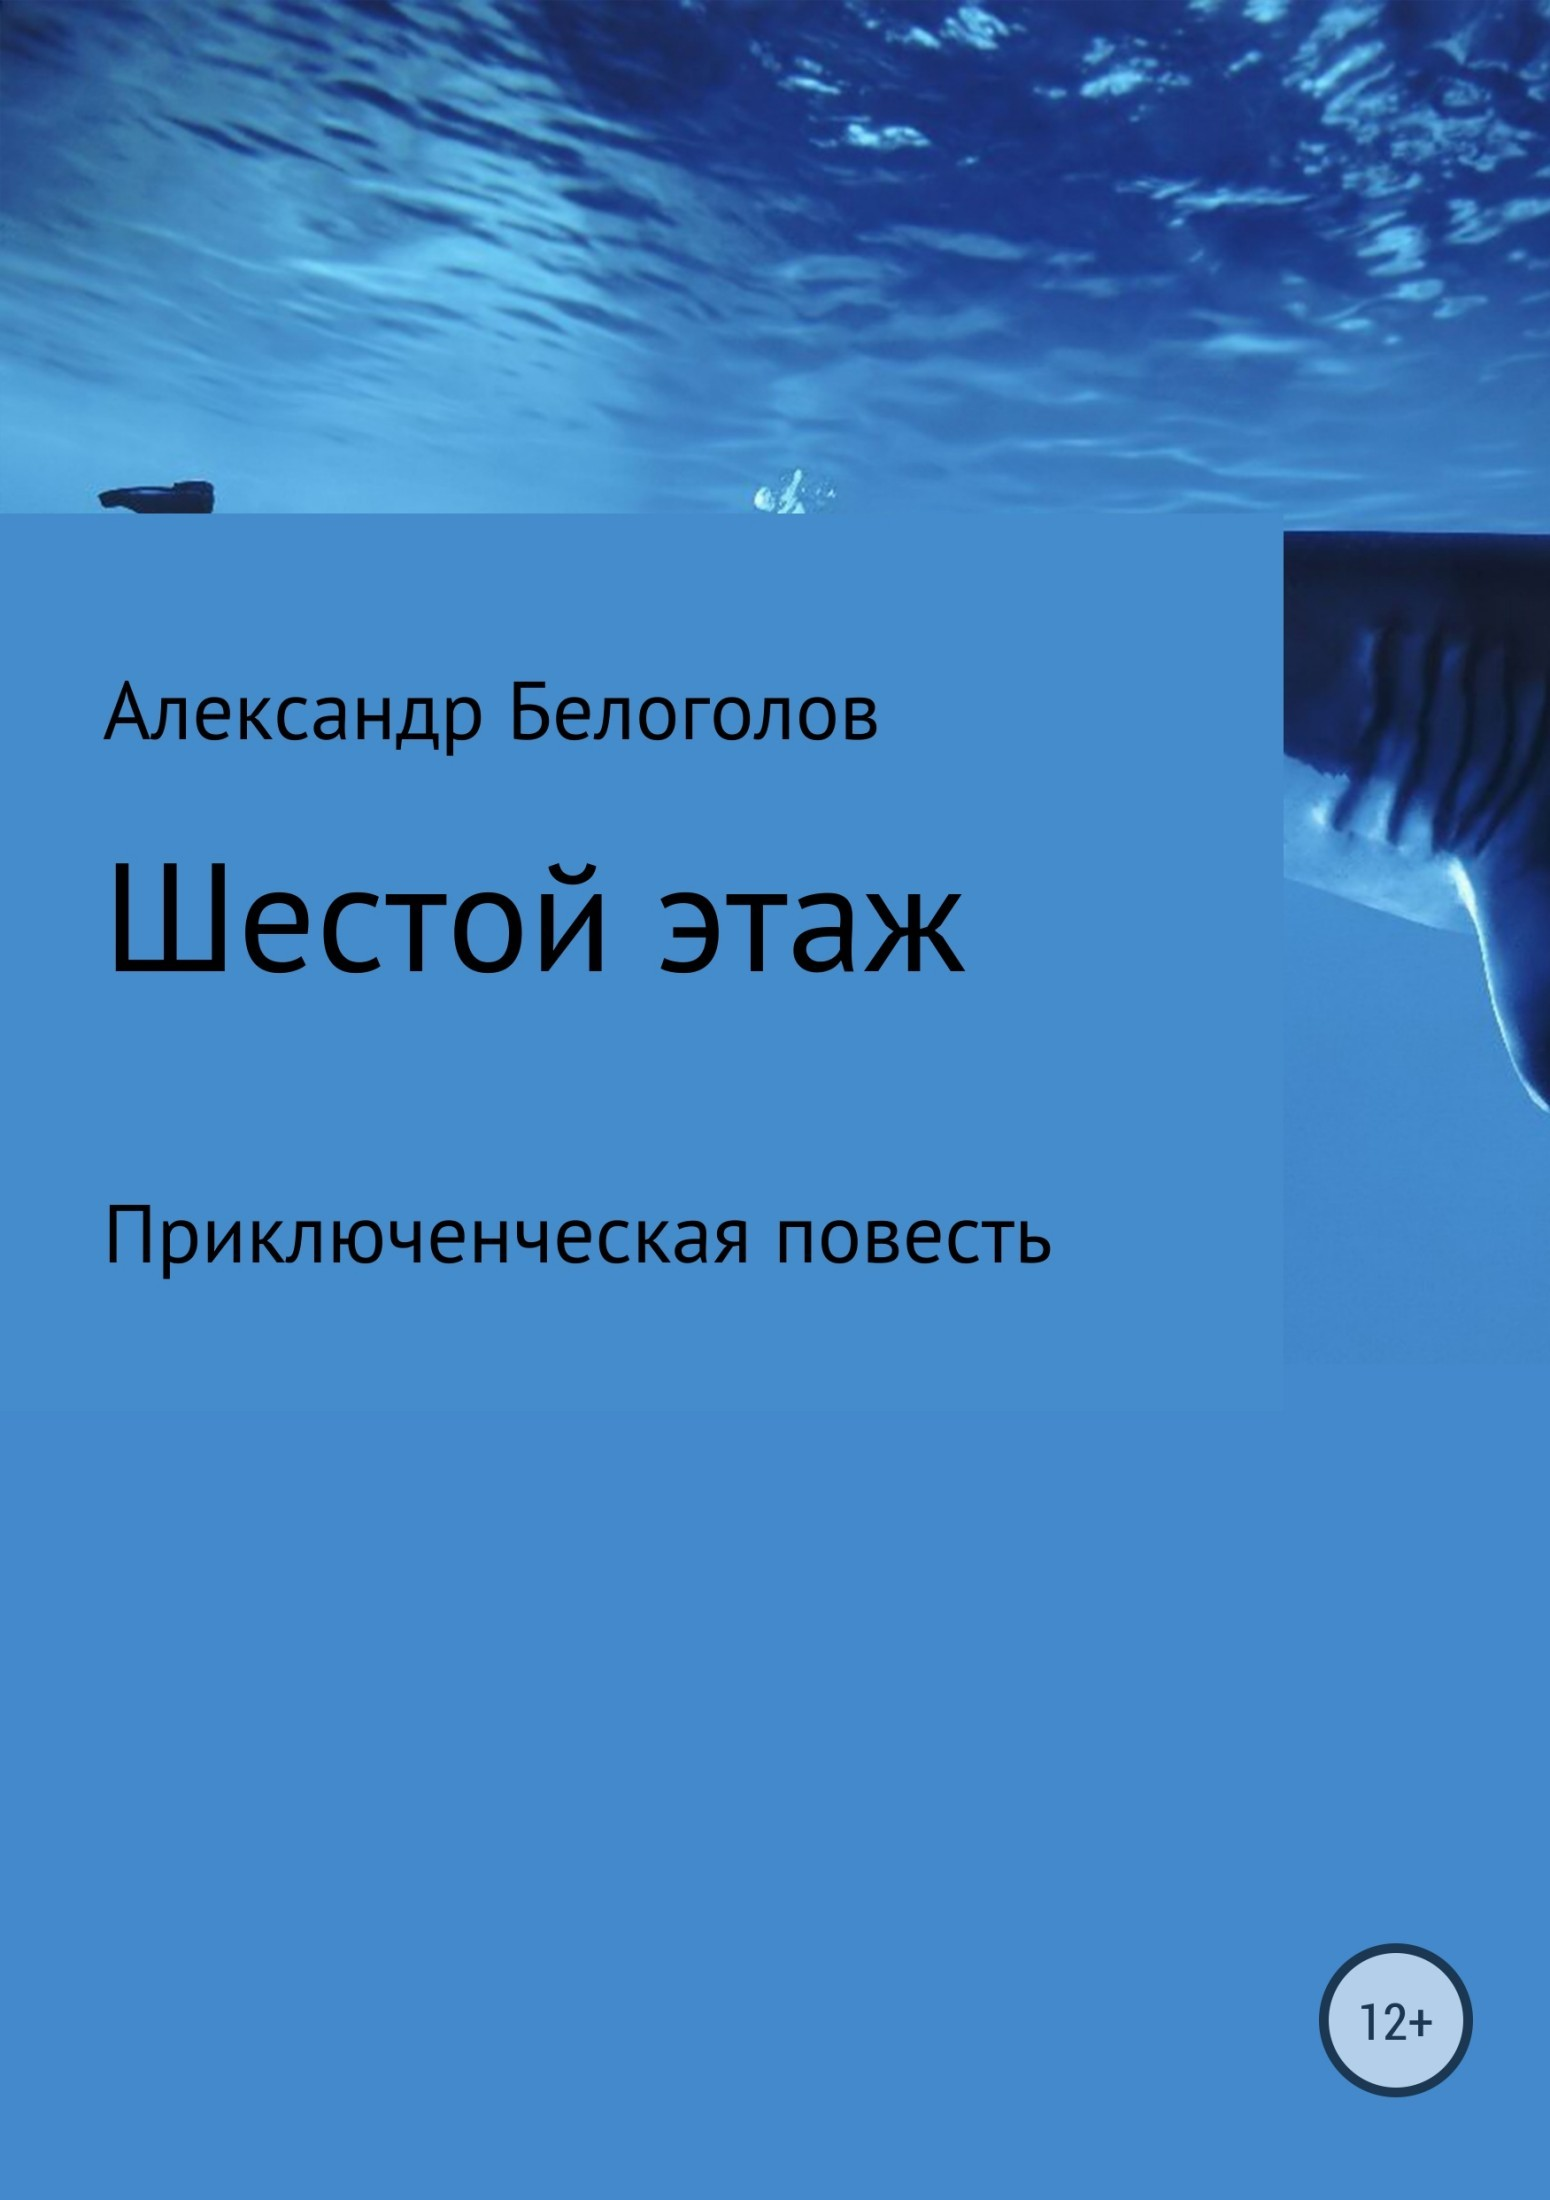 Александр Белоголов - Шестой этаж